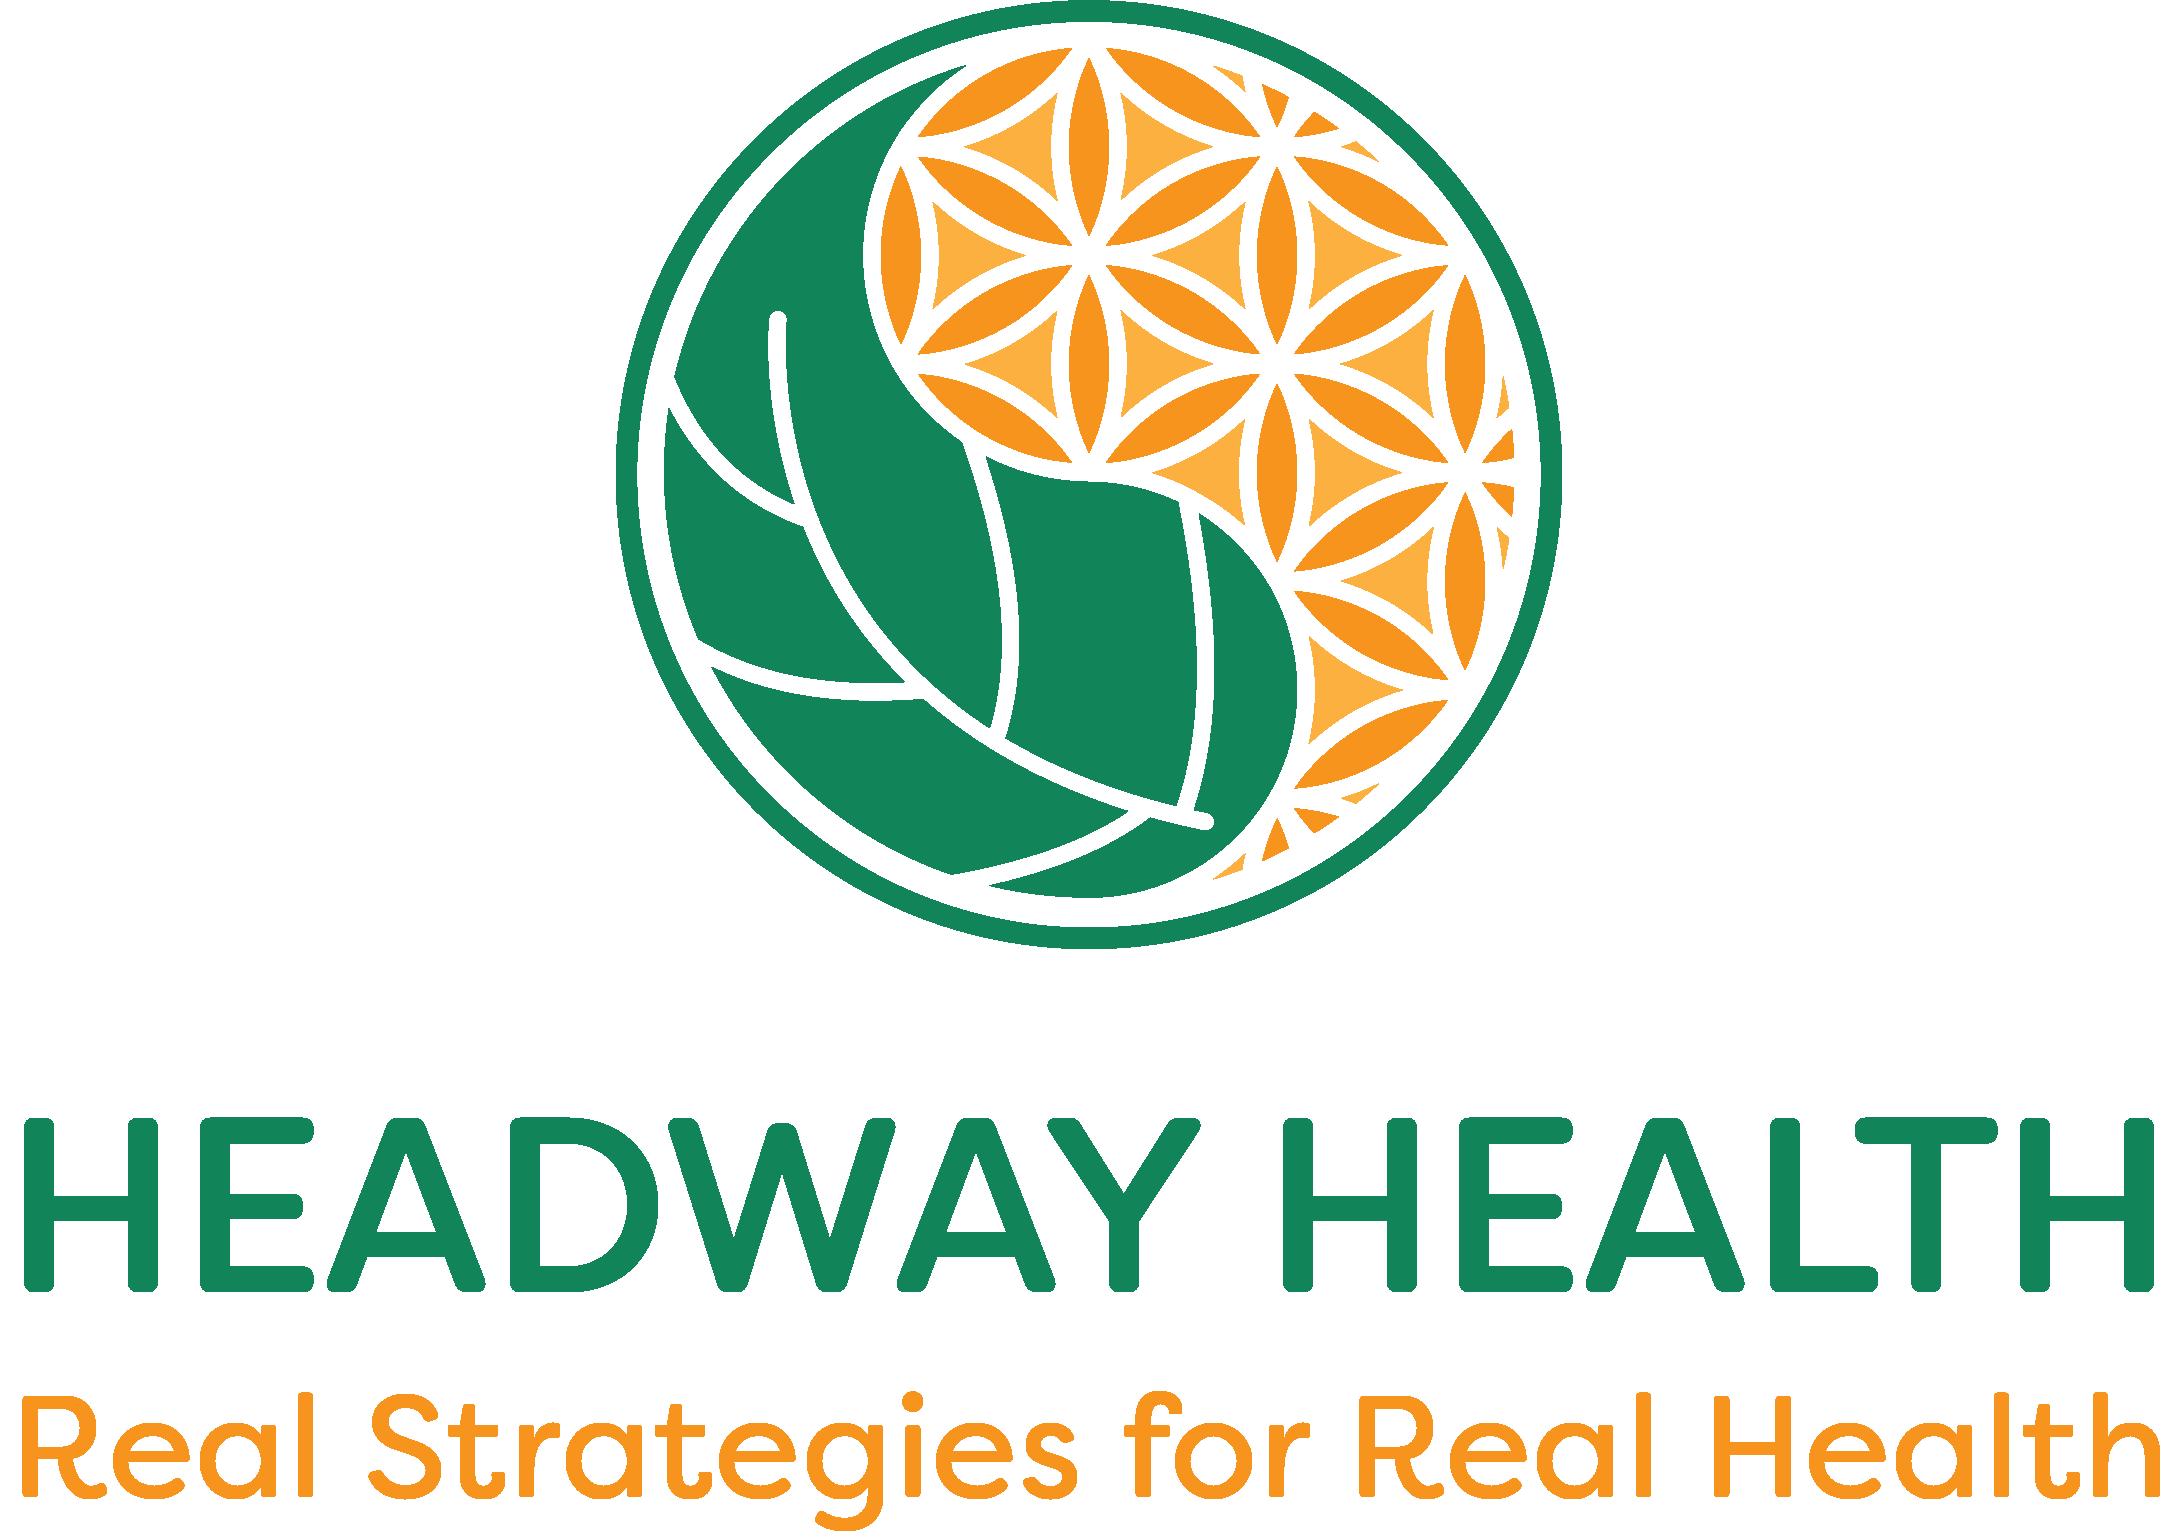 Headway Health